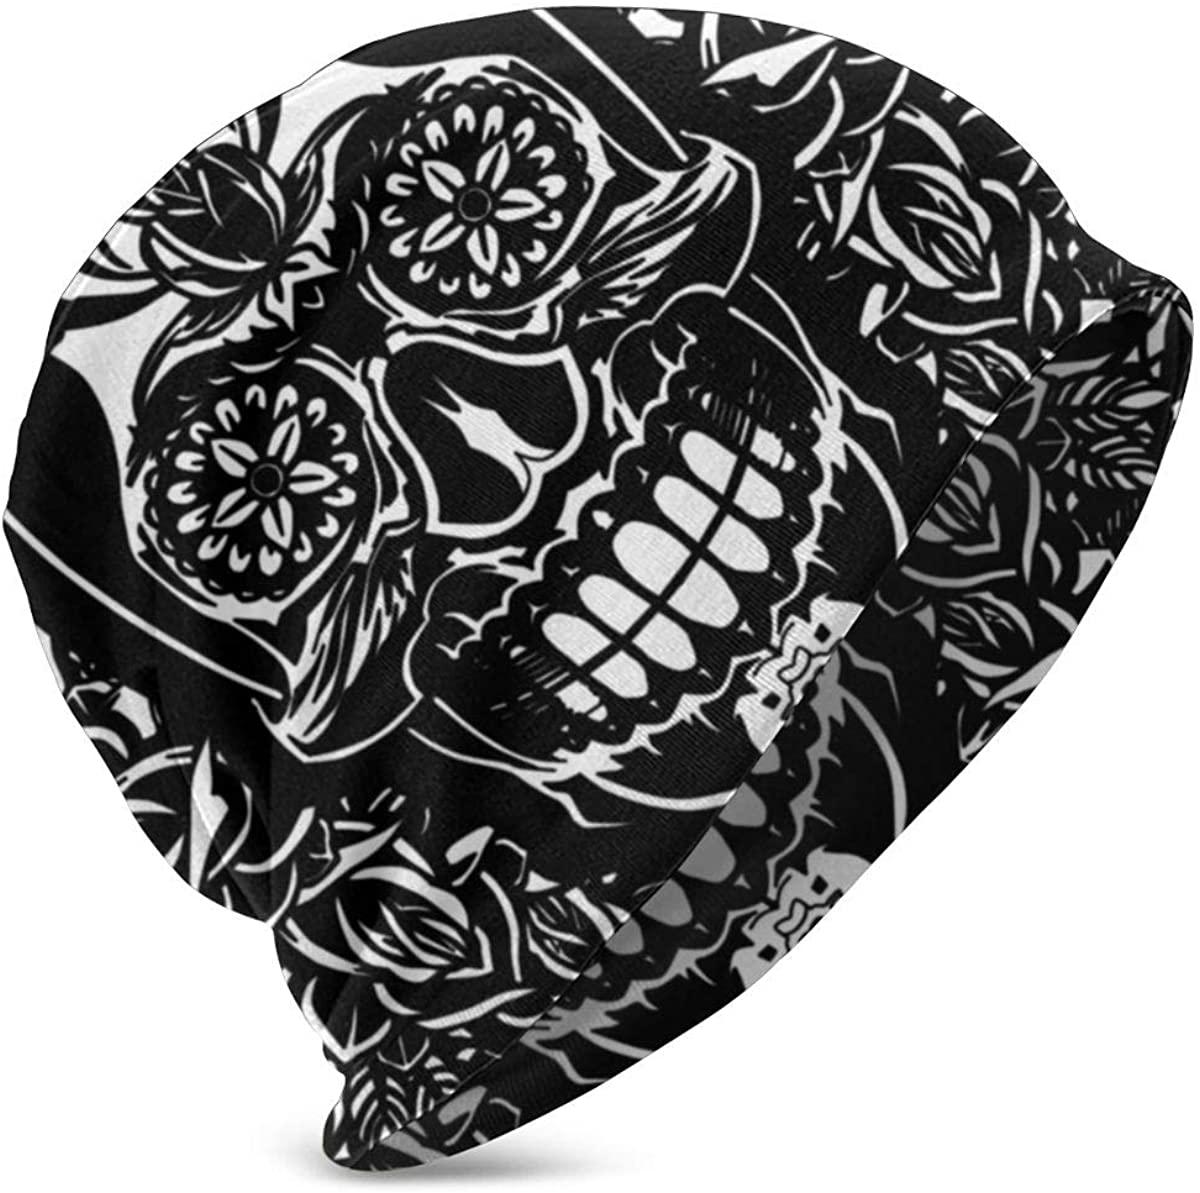 PETER HONG Fashion Beanie Hat Skull Hat, Multipurpose Earmuffs Hat Chemo Hat (Skulls)